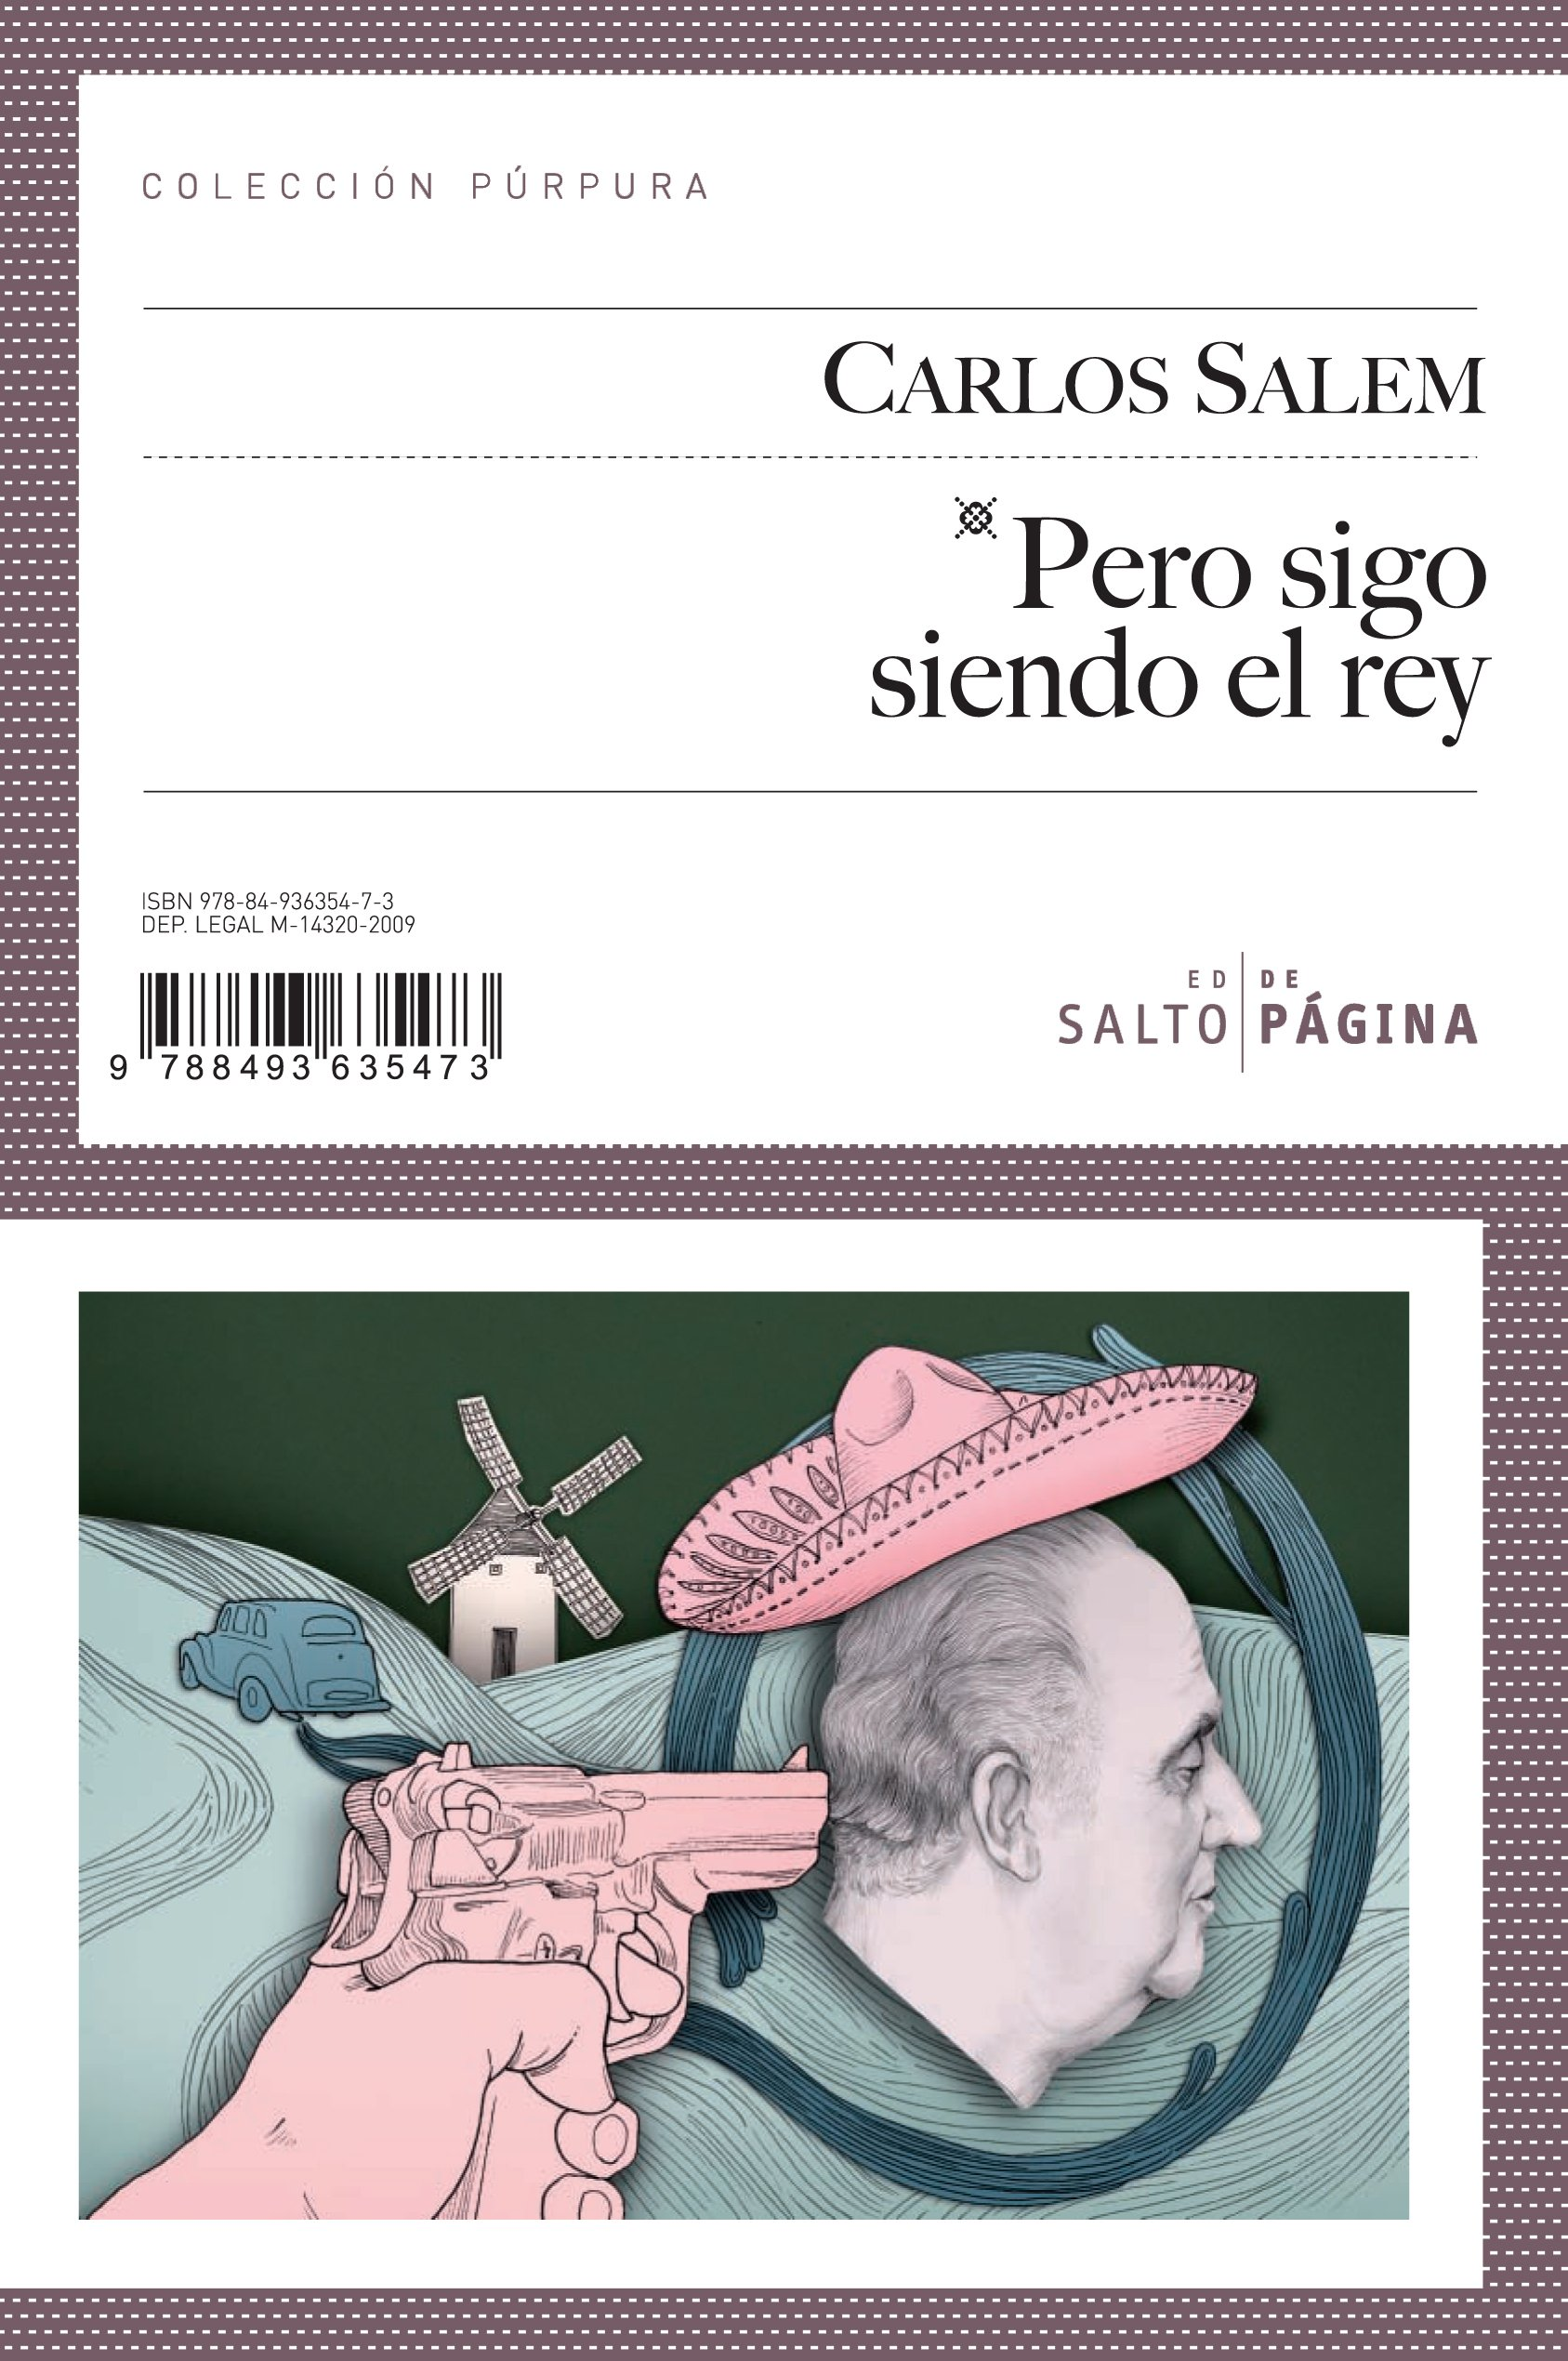 PERO SIGO SIENDO EL REY (Spanish Edition) (Spanish) Paperback – January 1, 2009